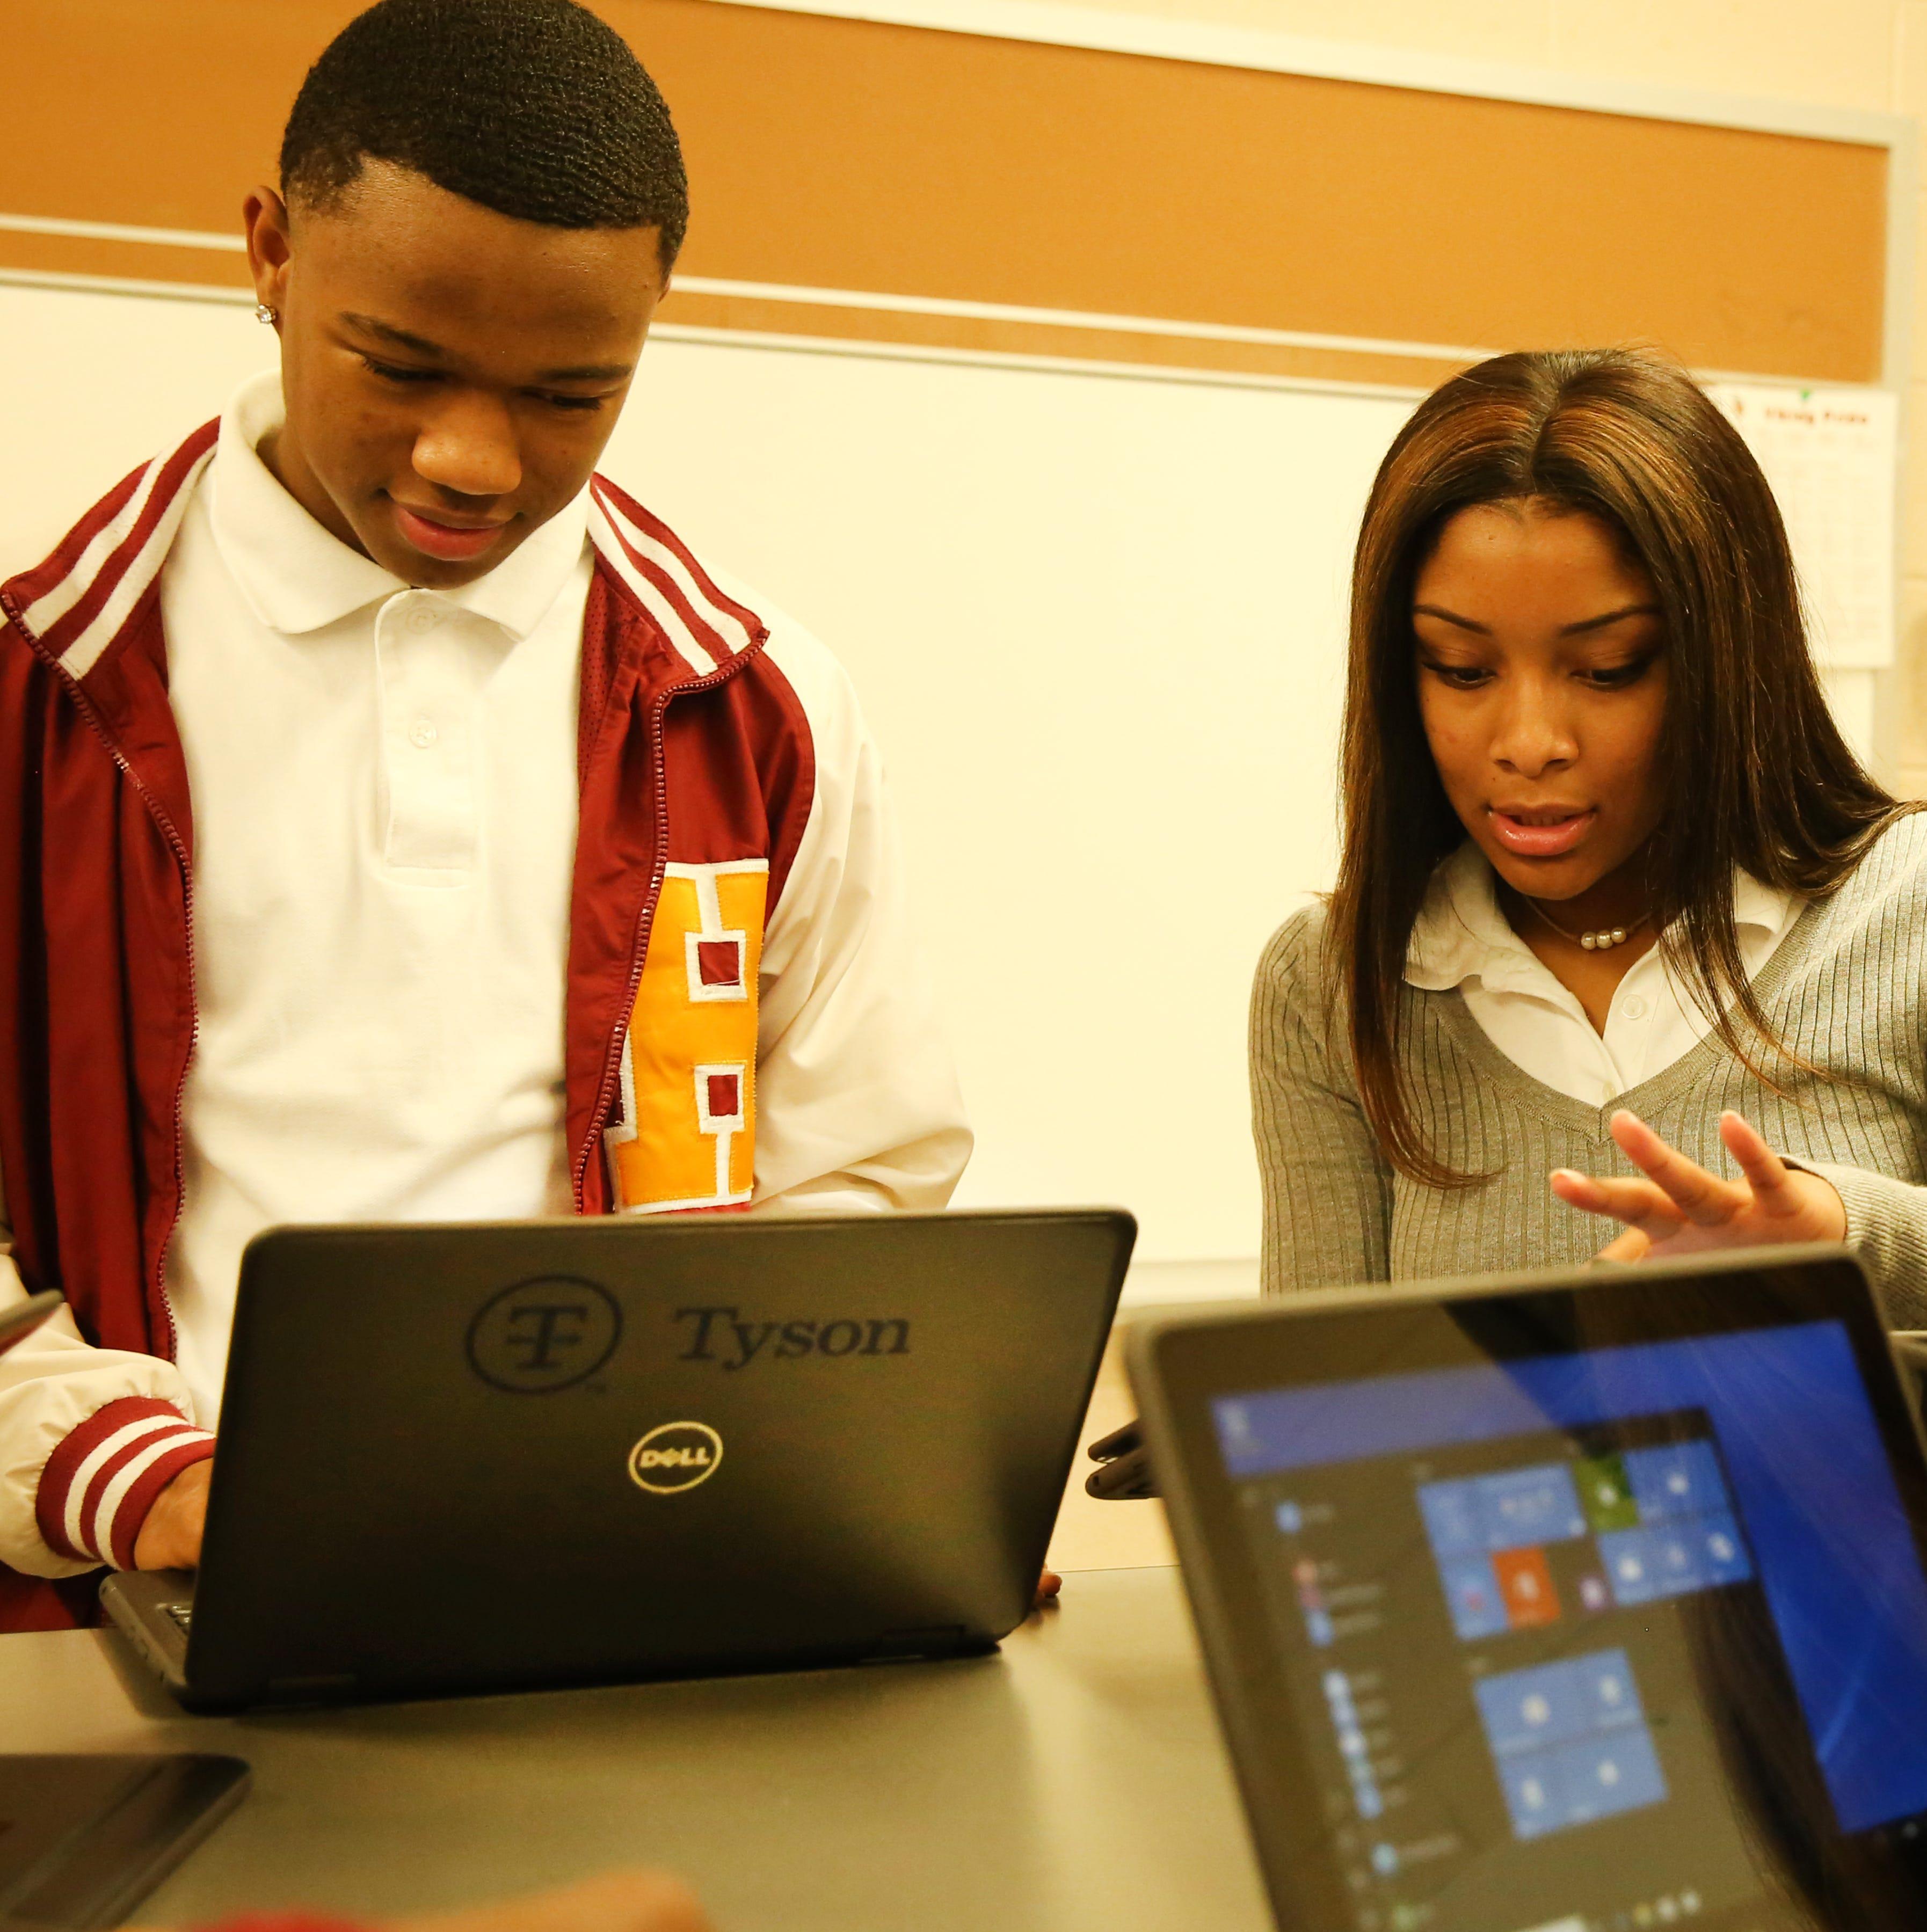 Robotics class gets upgrade from Tyson teacher grants; Tyson donates $500K to Humboldt